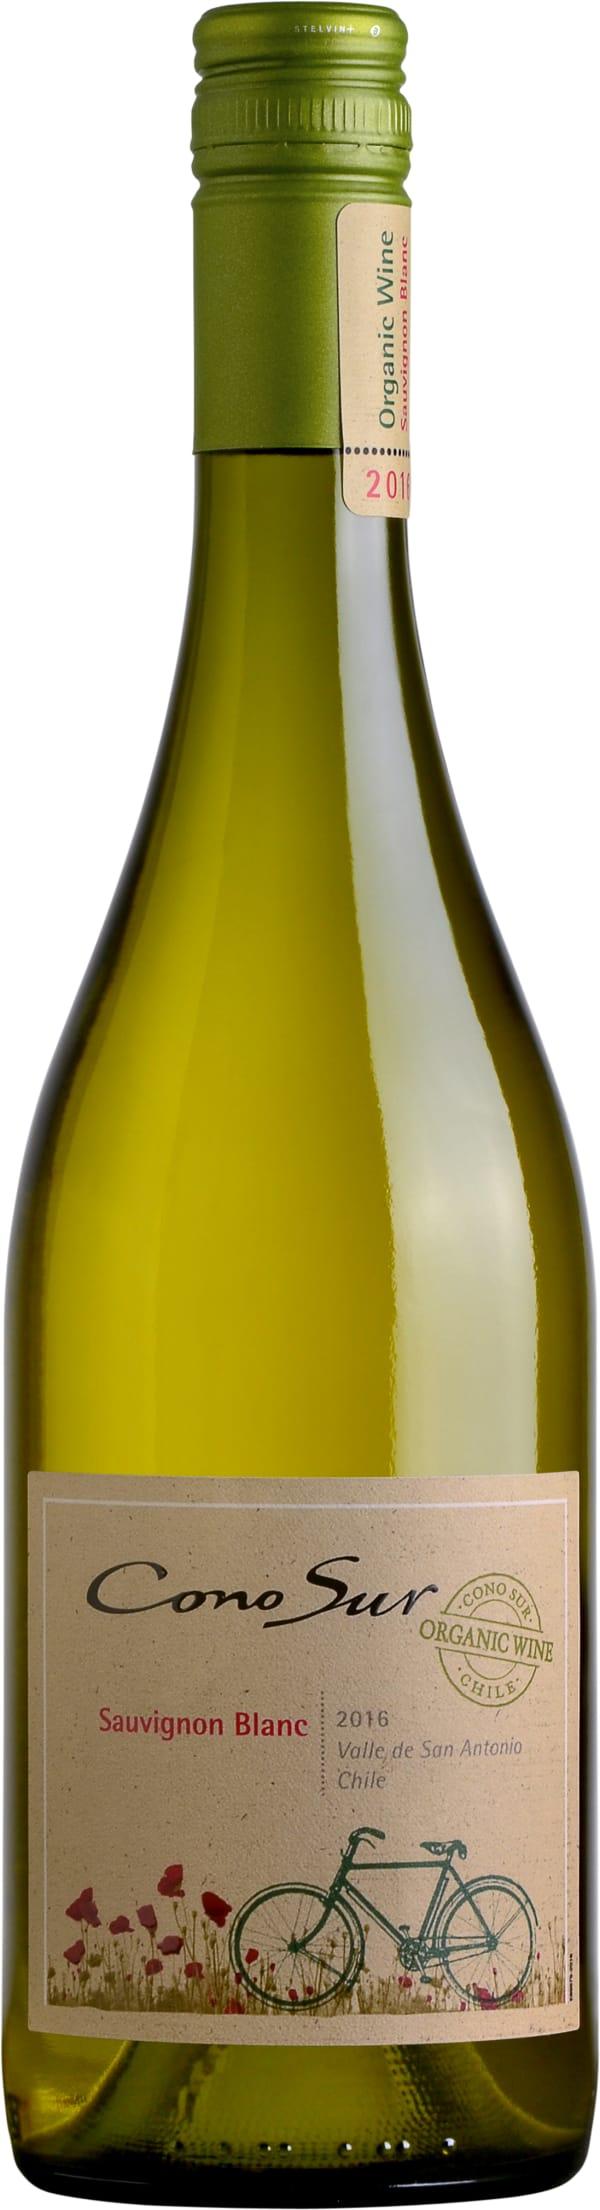 Cono Sur Organic Sauvignon Blanc 2018